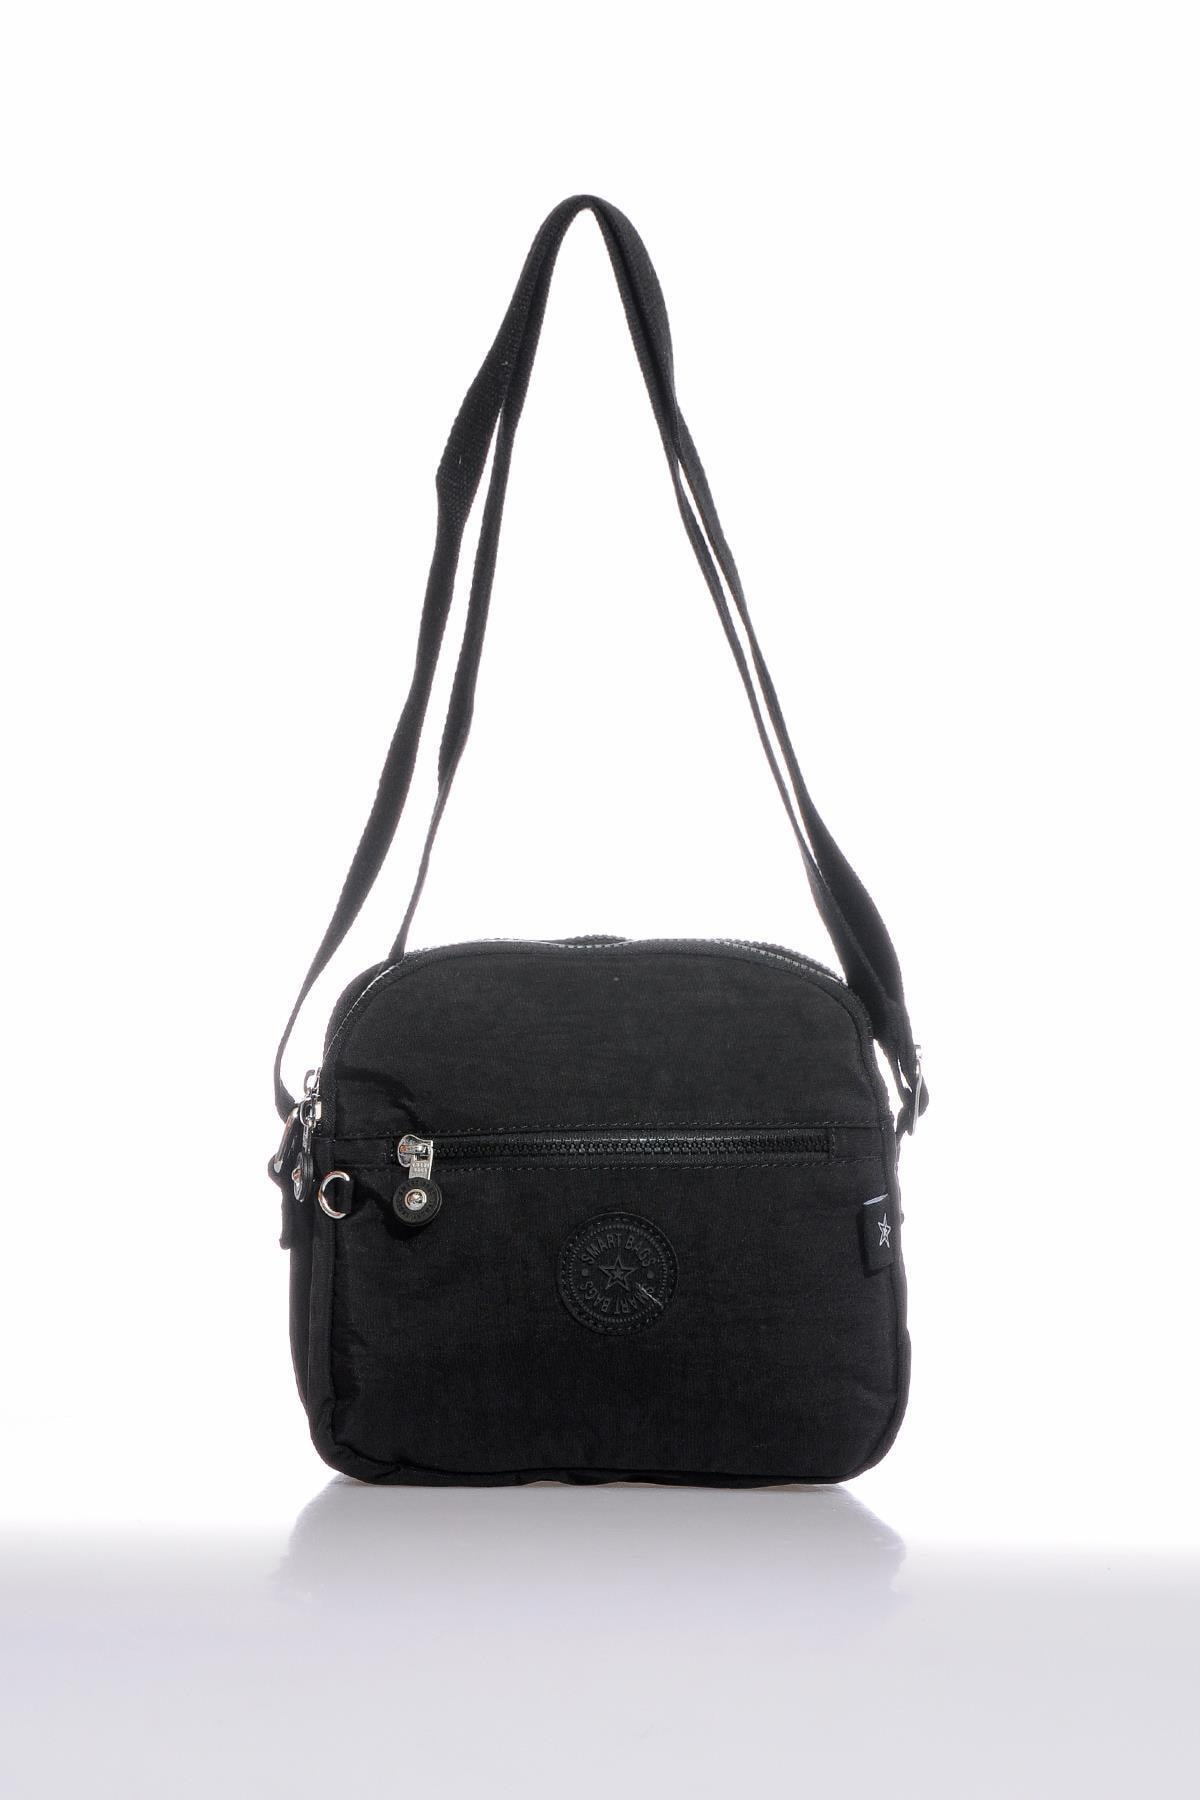 SMART BAGS Smb3058-0001 Siyah Kadın Çapraz Çanta 1